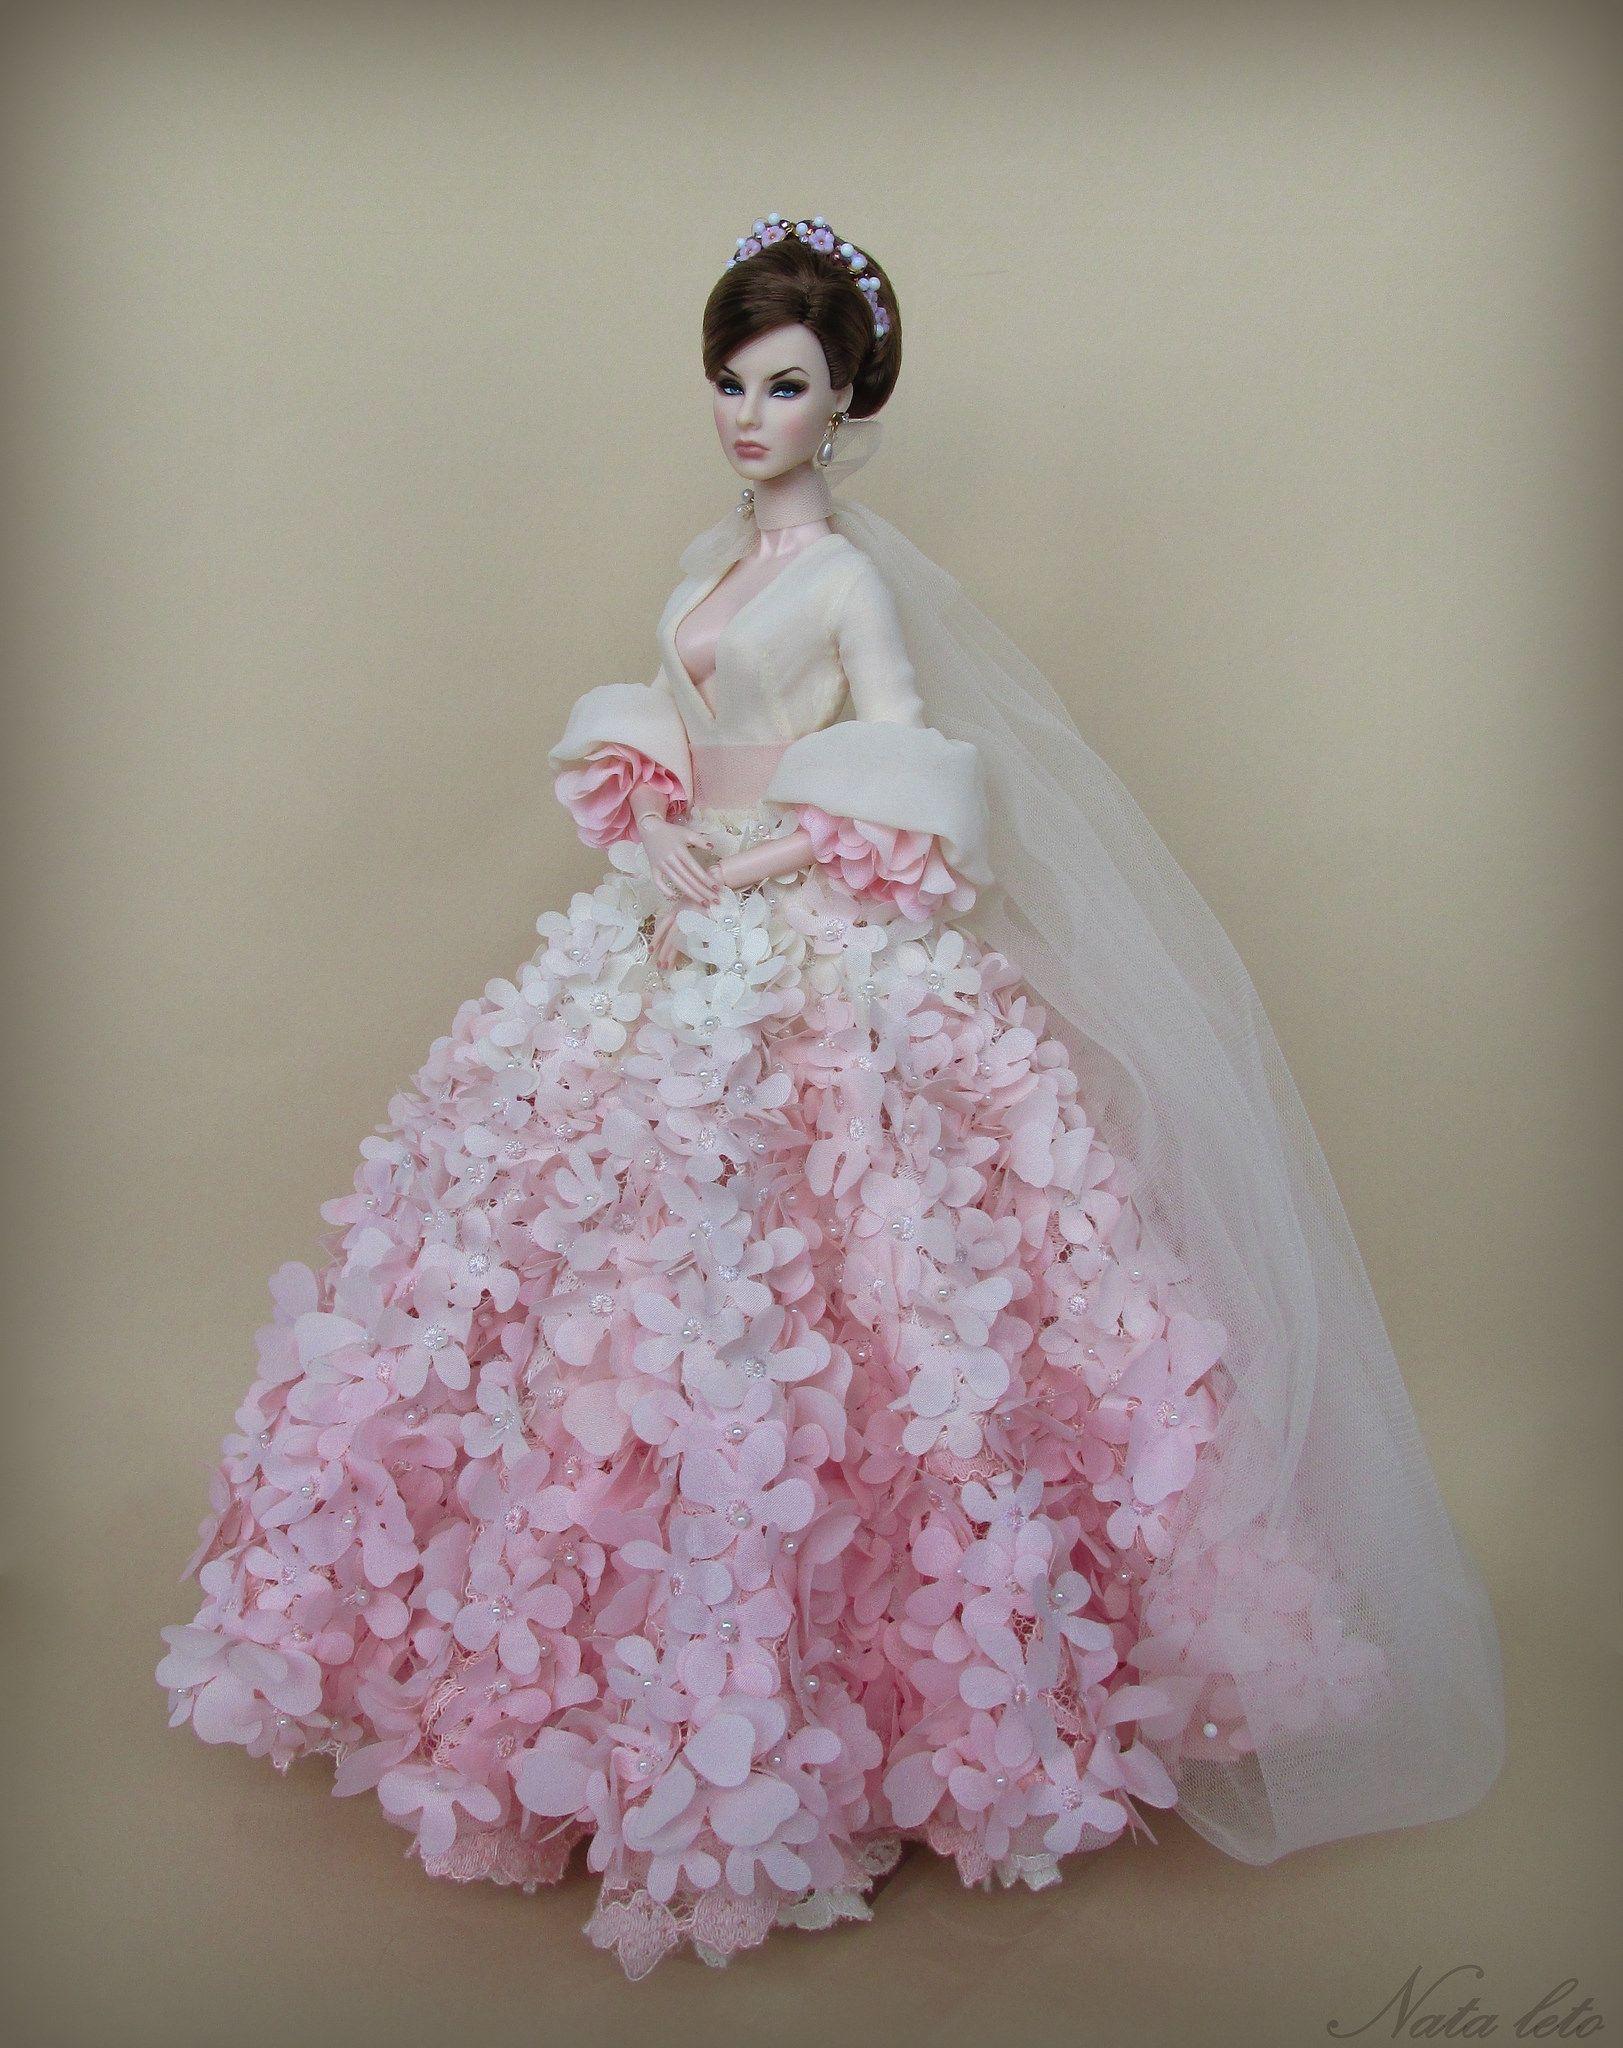 Doll wedding dress  Pin by Pam on Barbie accessories  Pinterest  Dolls Barbie doll